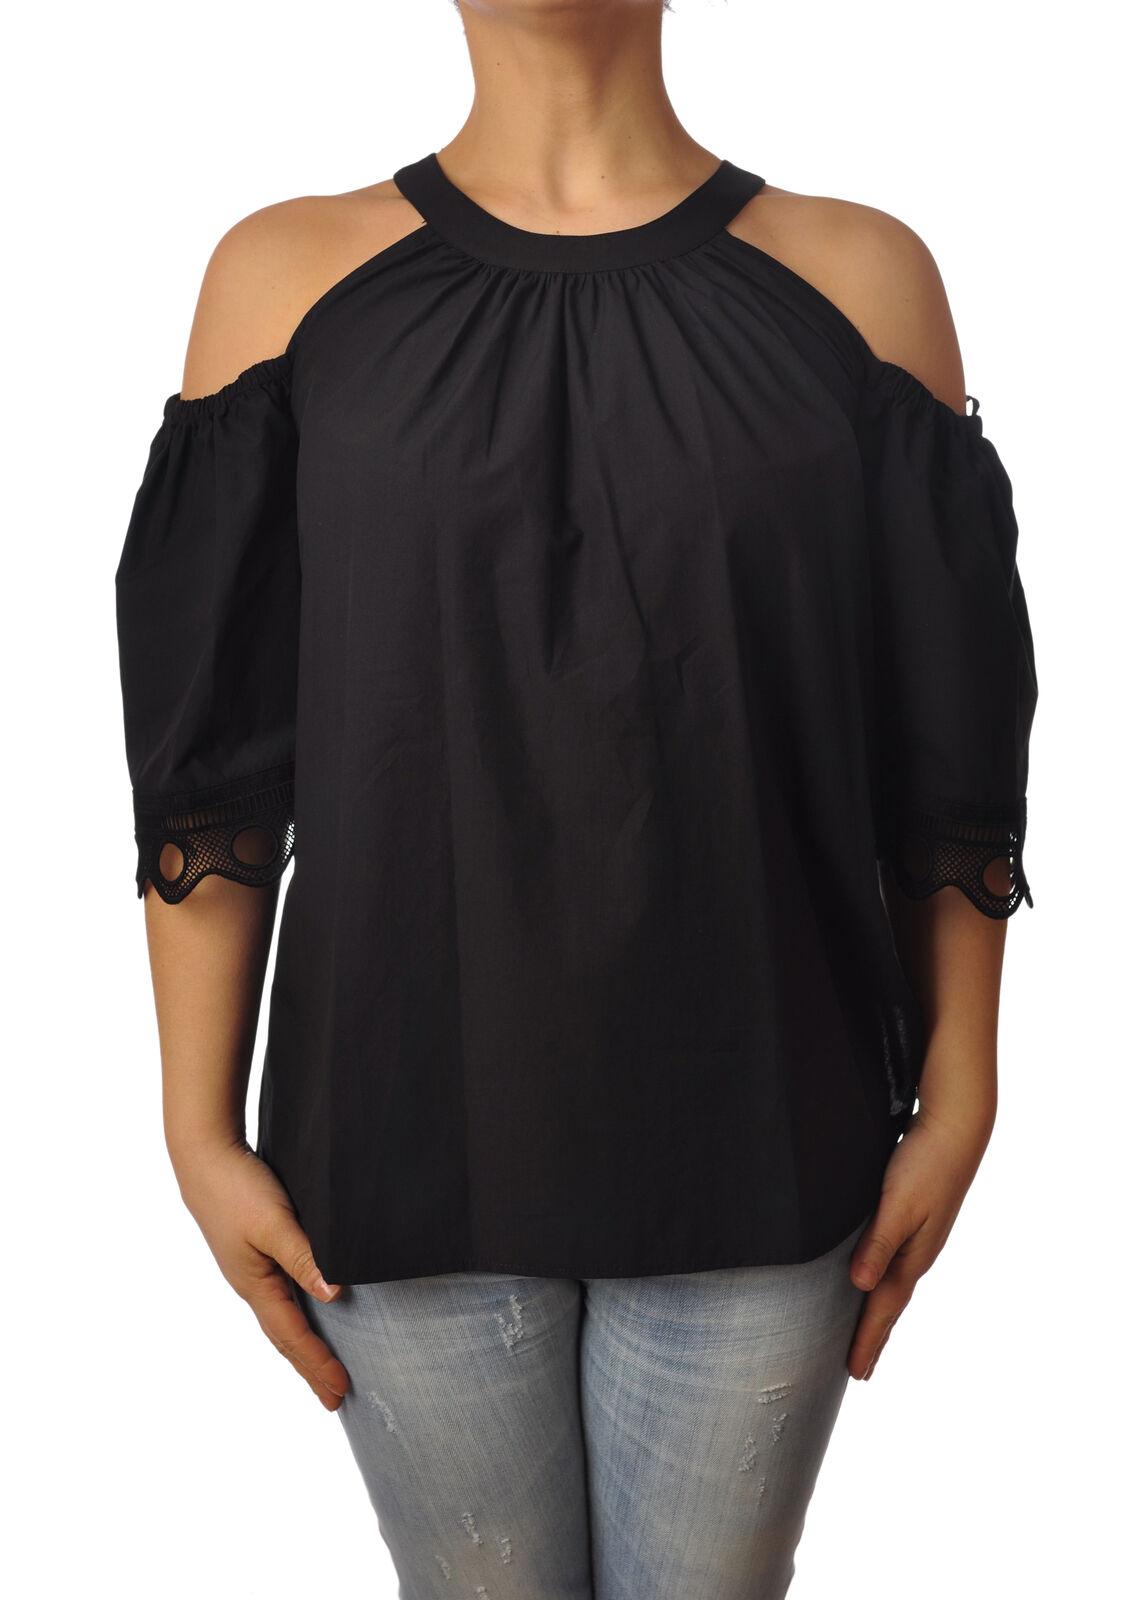 Ottod'ame - Blausen-Shirt - Frau - Schwarz - 4950115G181148